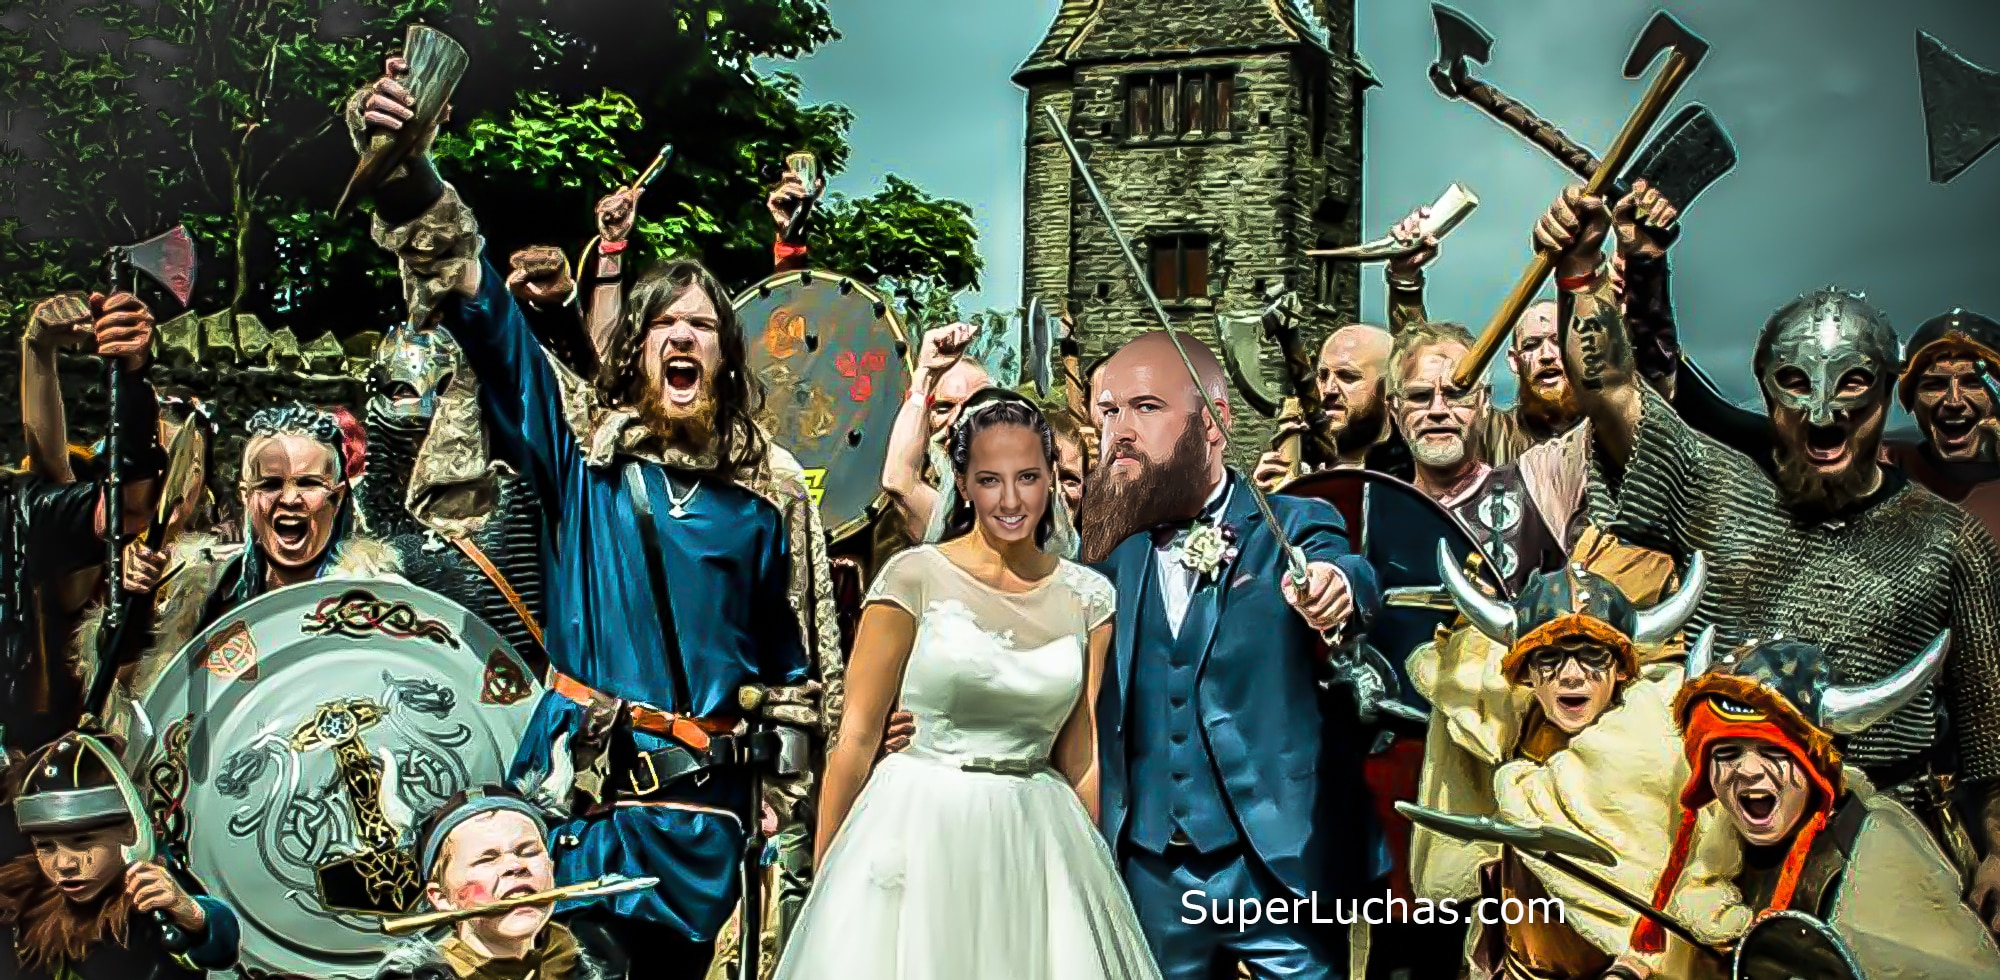 Sarah Logan / Raymond Rowe / WWE© / SuperLuchas.com / SÚPER LUCHAS